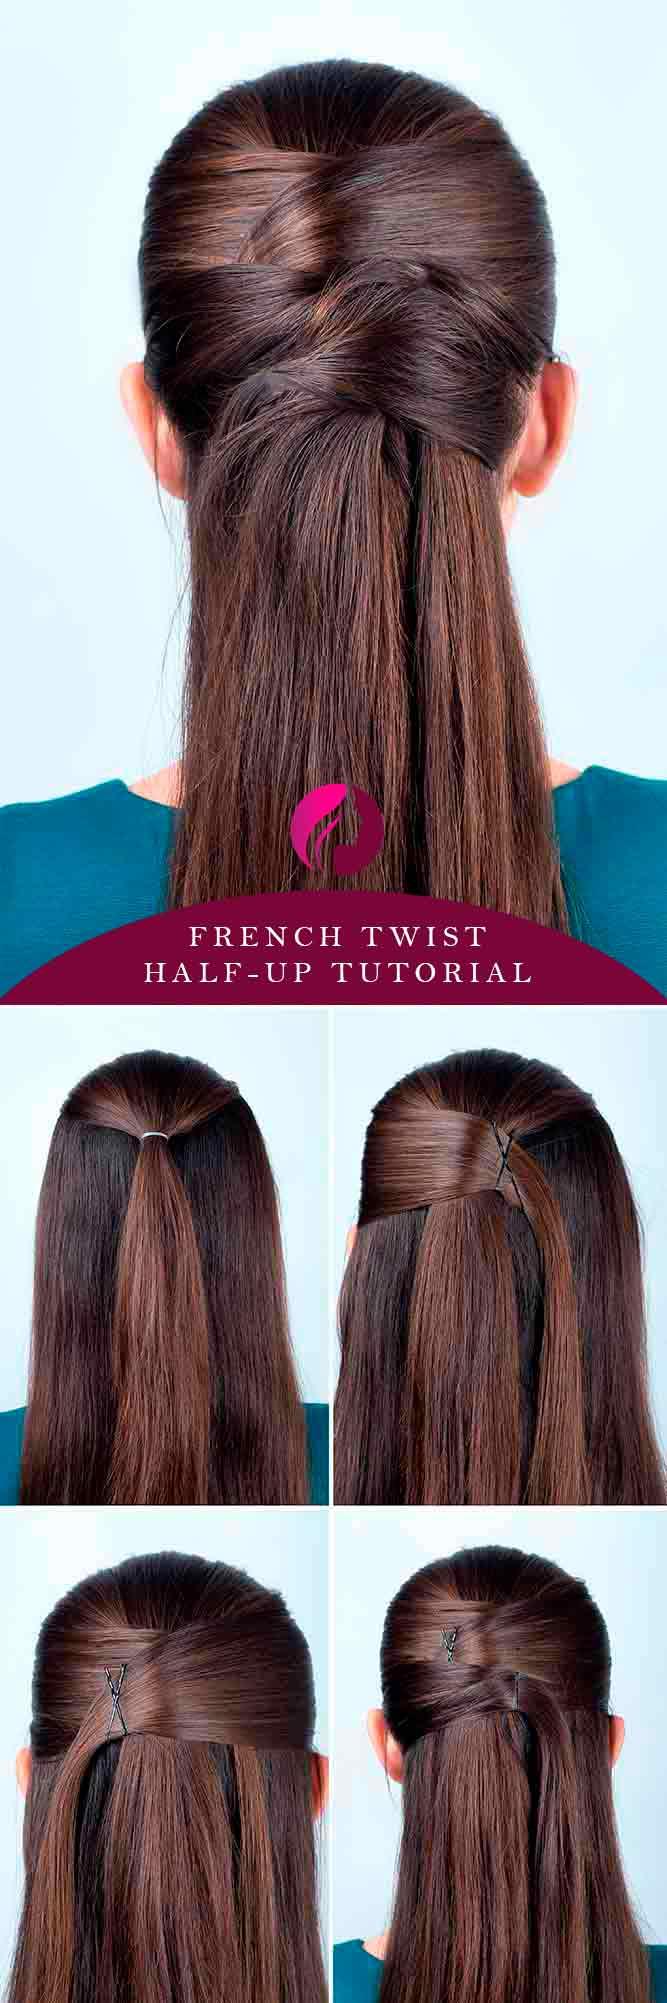 French Twist Half-Up #hairtutorial #easyhairstyles